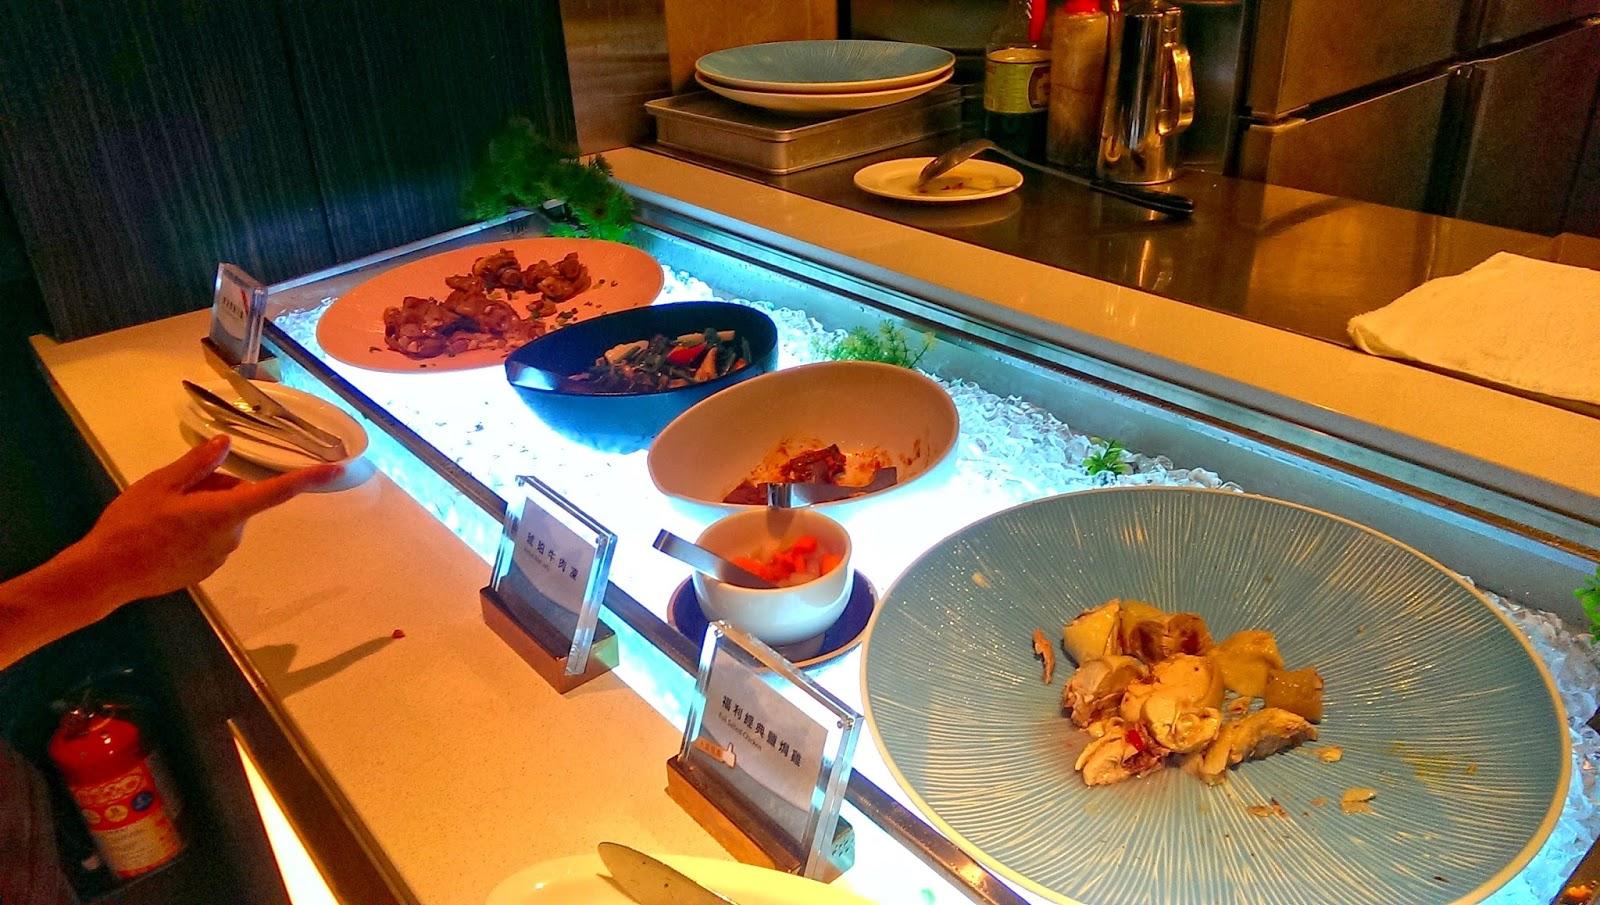 2015 07 01%2B19.15.25 - [食記] 台北京站 - 饗食天堂,有生魚片吃到飽的高級自助餐廳!